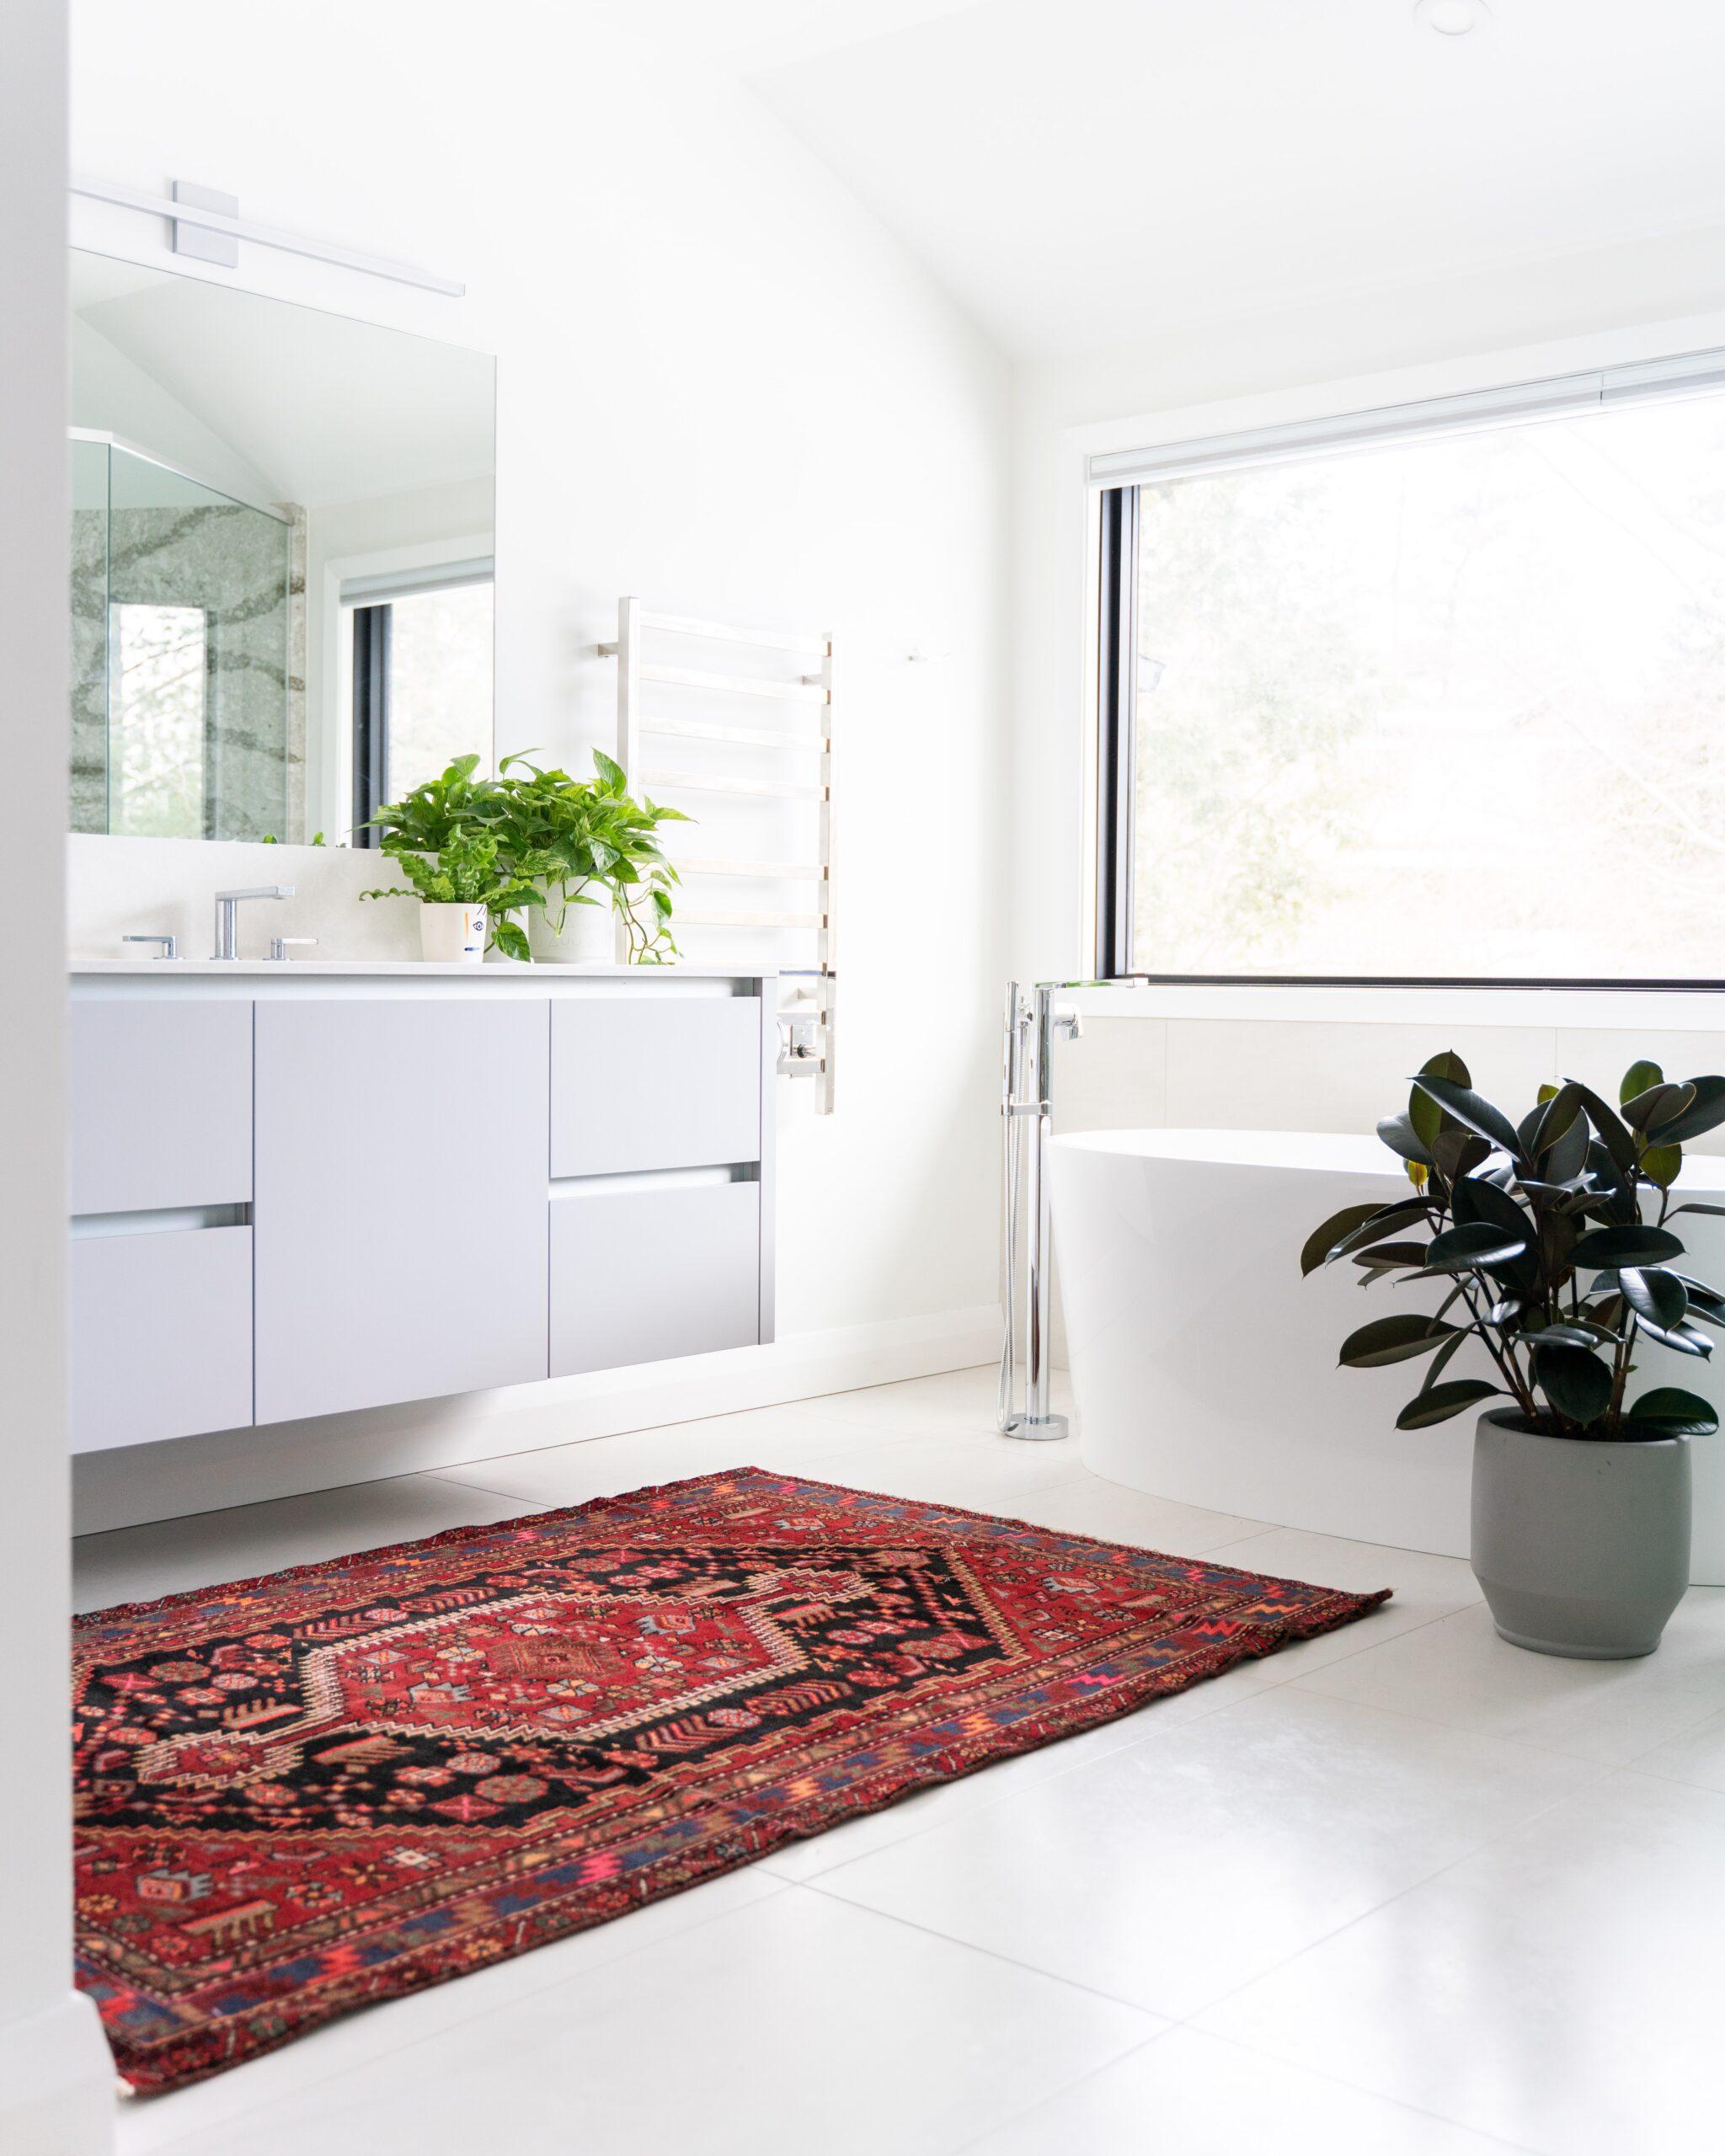 Small budget bathroom renovation